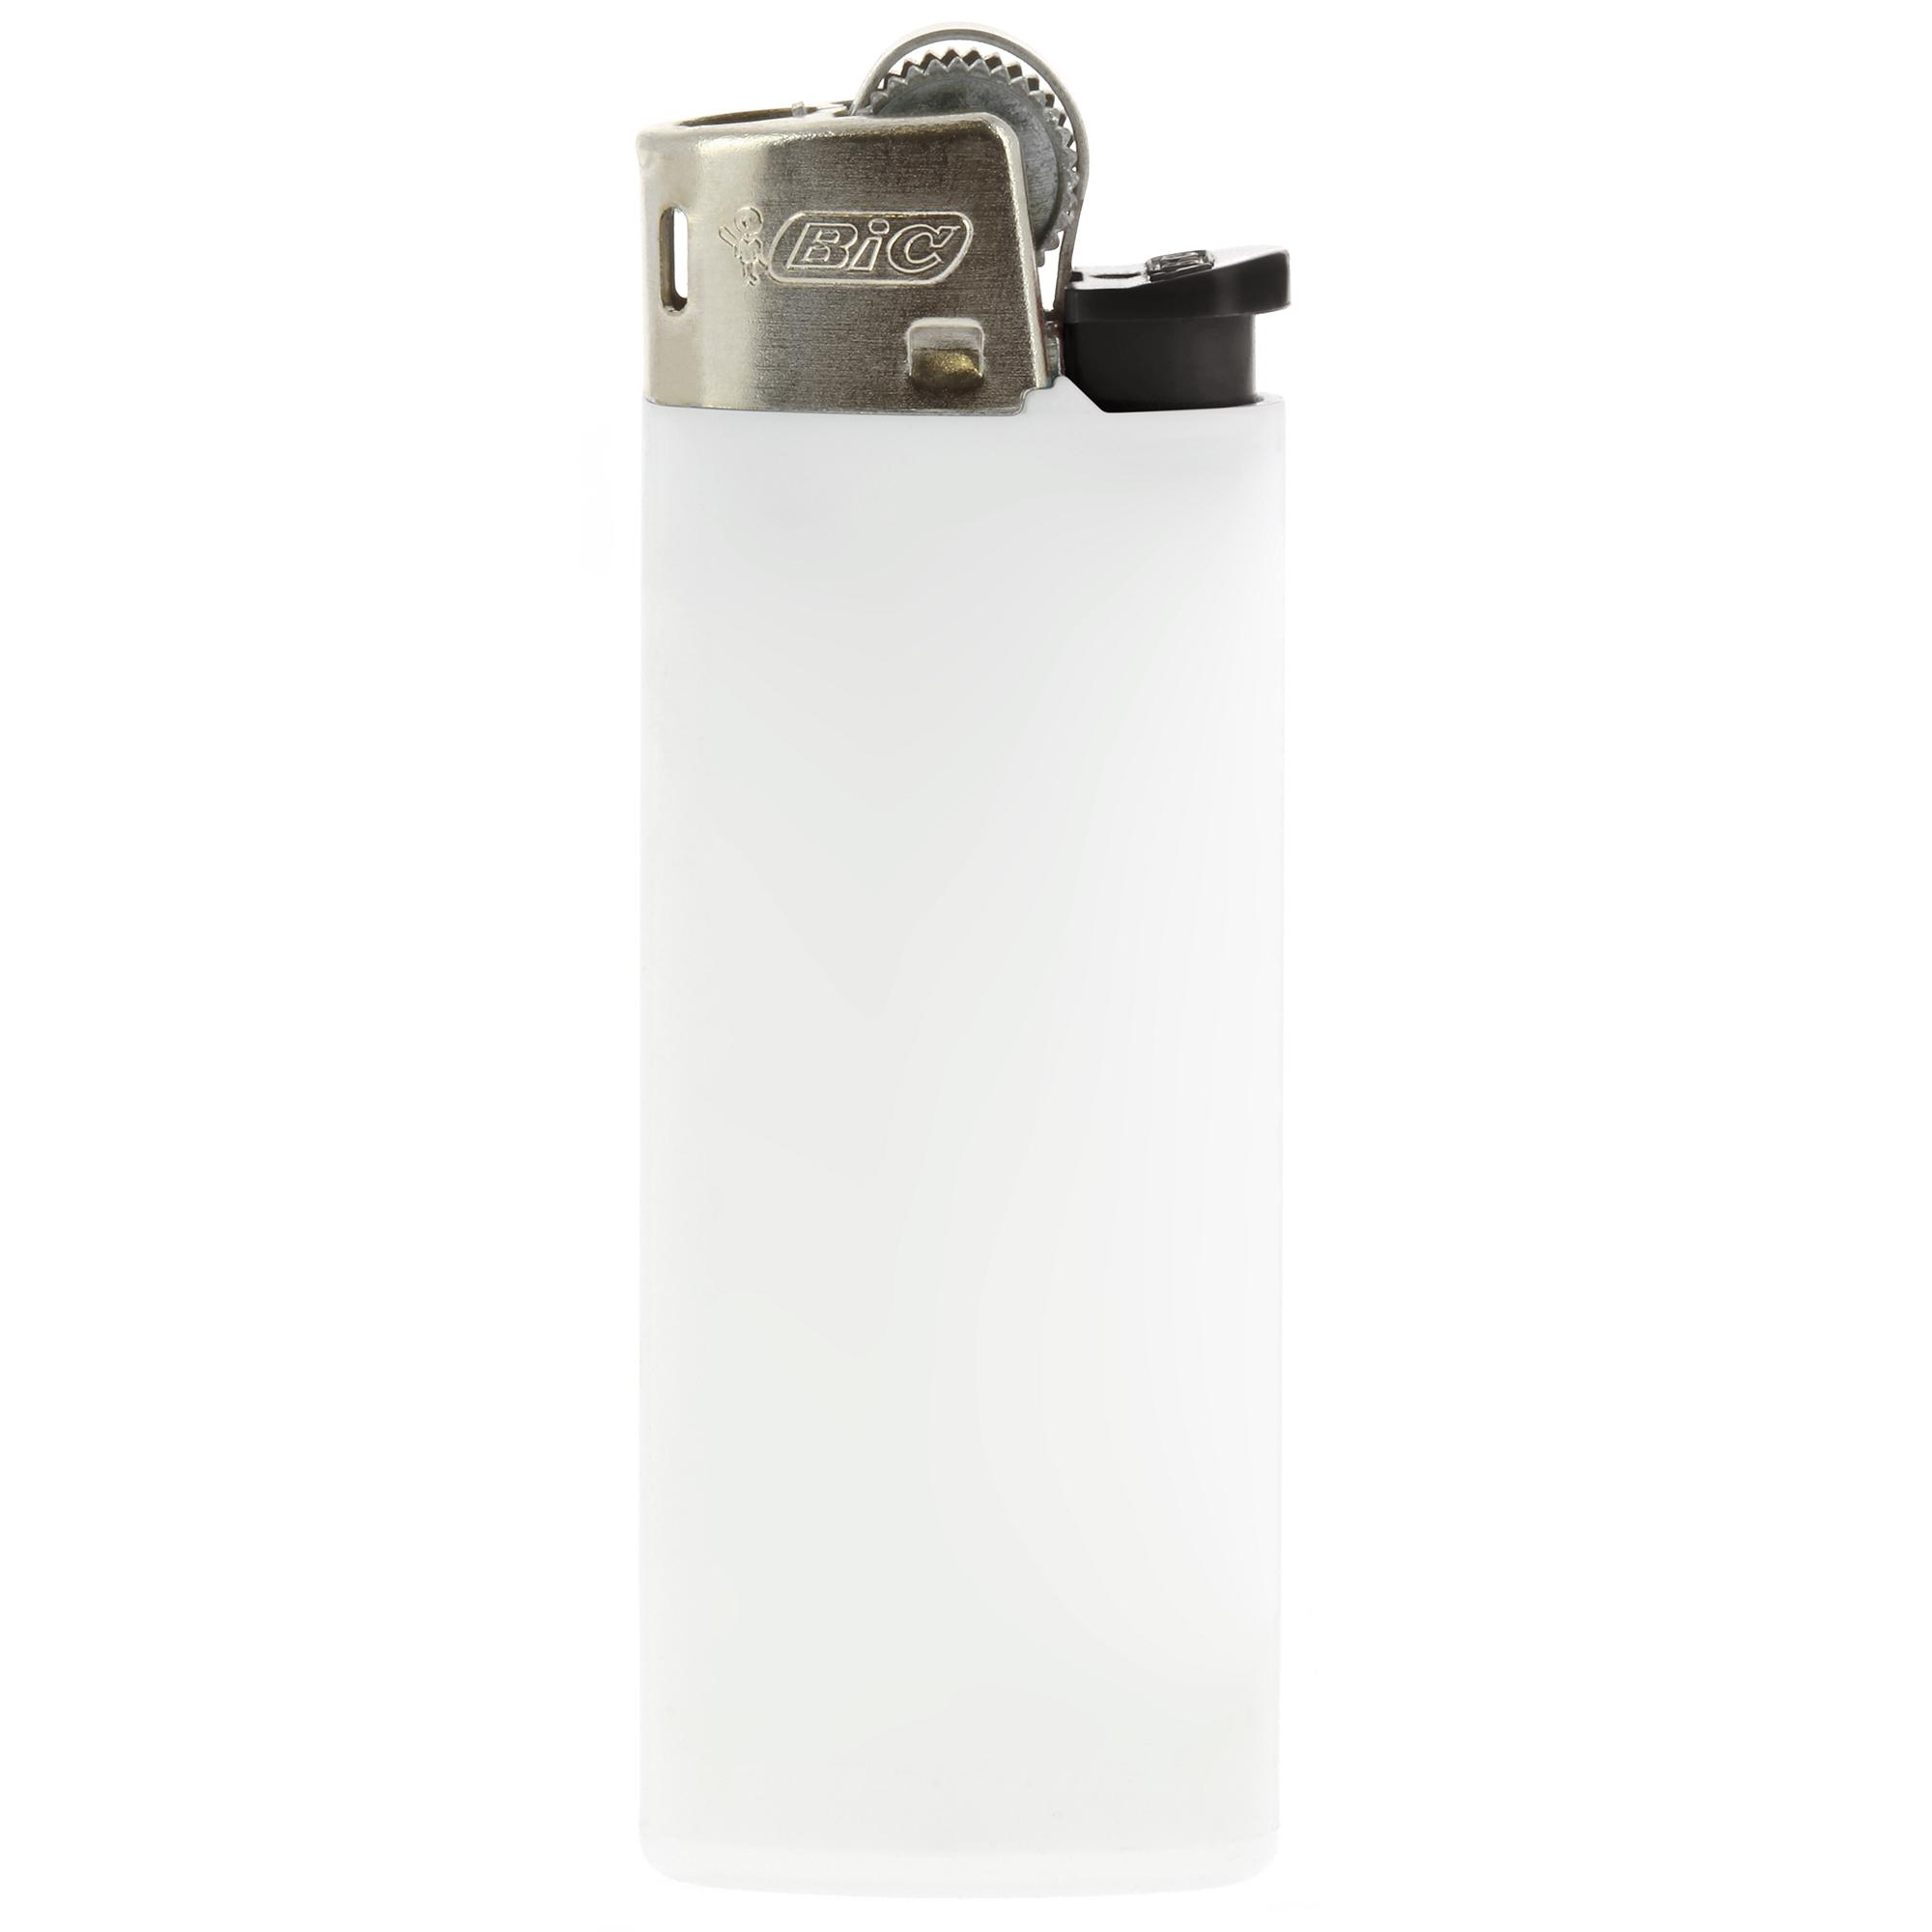 bic-lighter-mini-2360-1